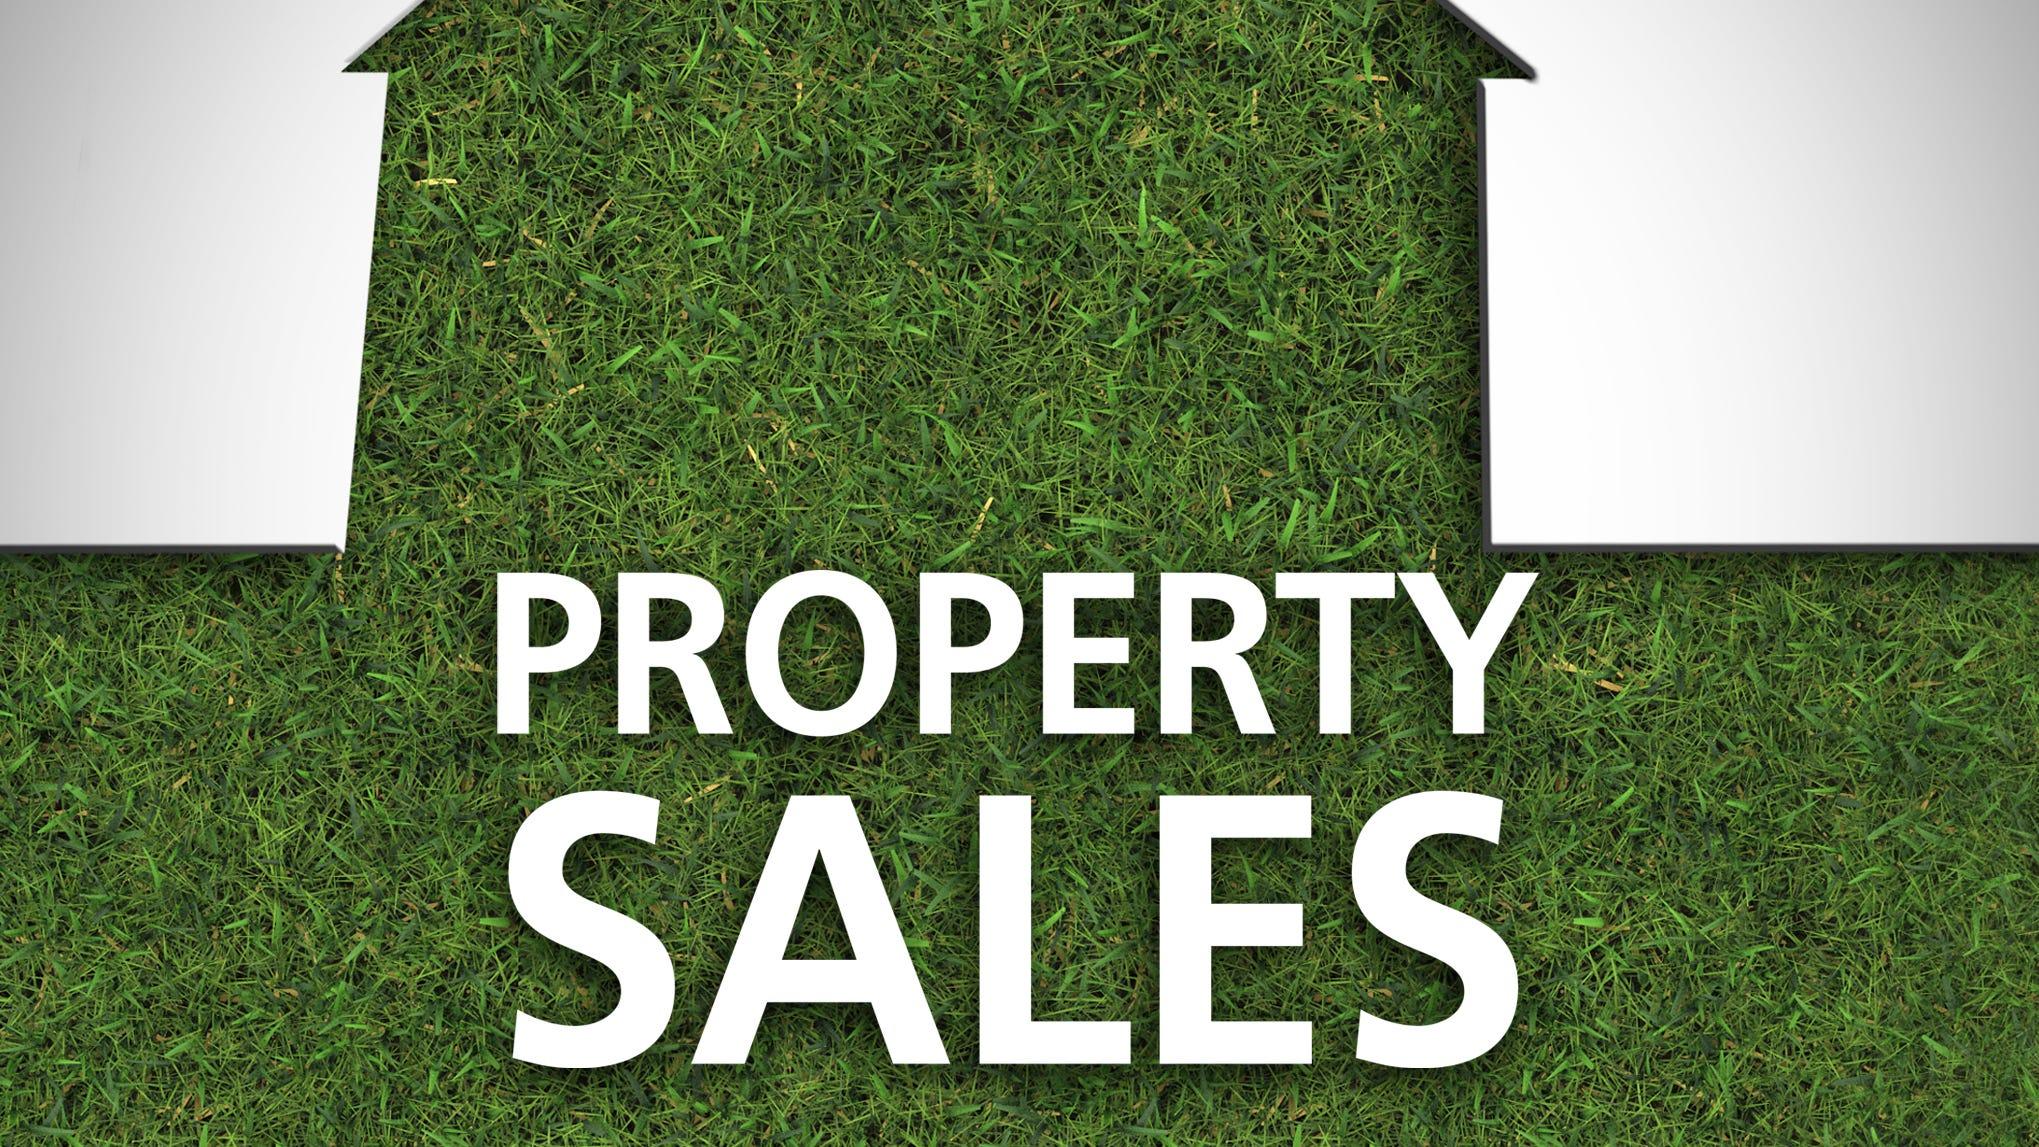 912698b9 b790 492e b875 b204ab785d78 Property transfers jpg?crop=2039,1147,x0,y510&width=2039&height=1147&format=pjpg&auto=webp.